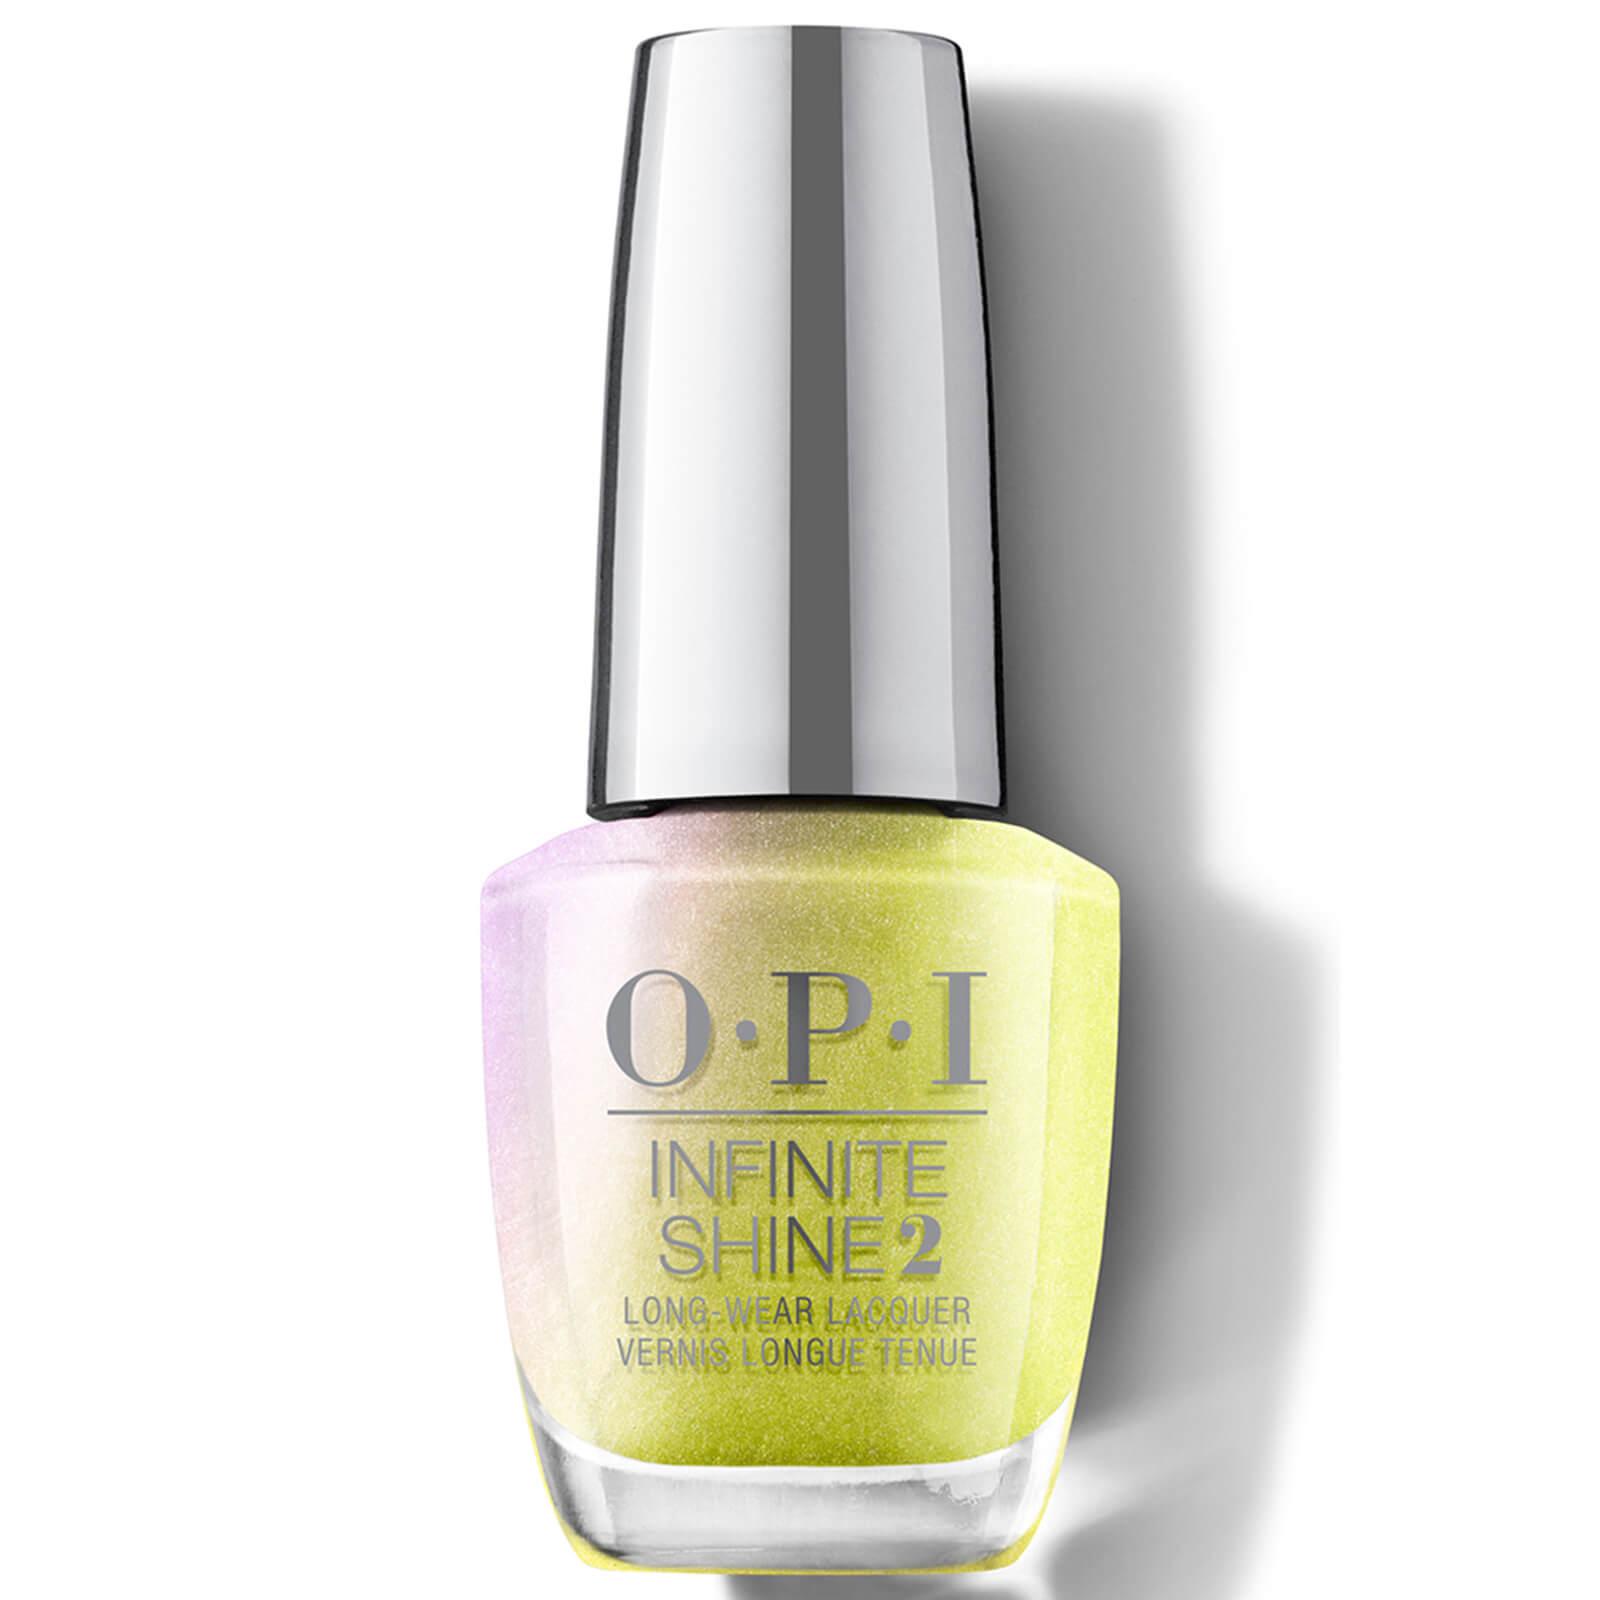 OPI Hidden Prism Limited Edition Infinite Shine Long Wear Nail Polish, Optical Illus-sun 15ml